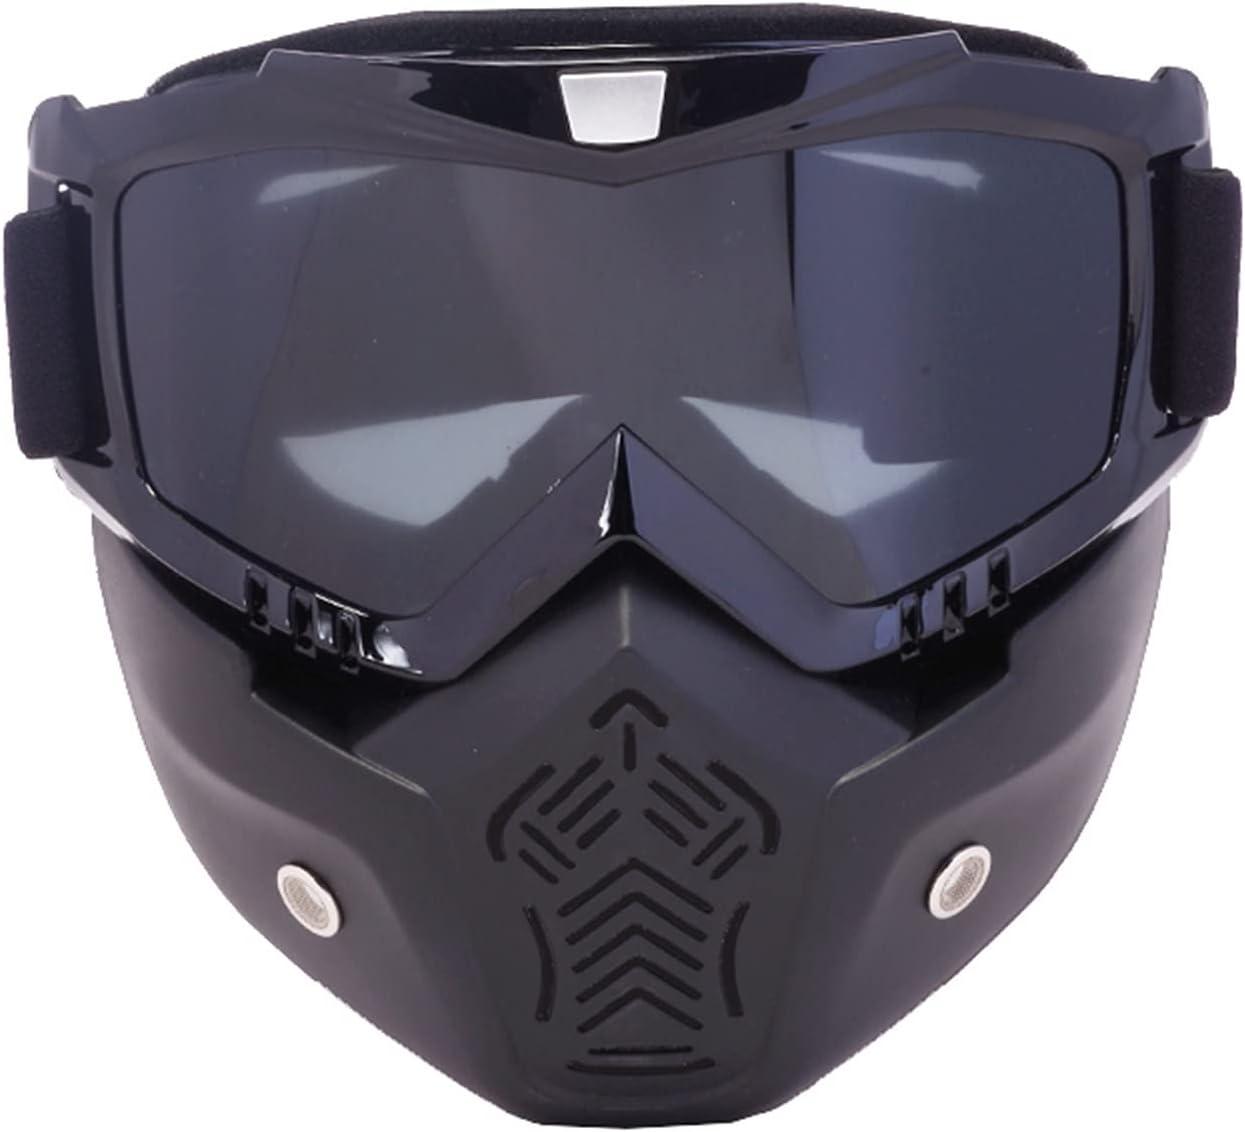 SCAYK Gafas de esquí Máscara Modular Mascarilla Detachable Boca Filtro Hombres Mujeres Ski Snowmobile Snowboard Gafas Snow Invierno Gafas de esquí Ski Bike Dirt Bike Goggles